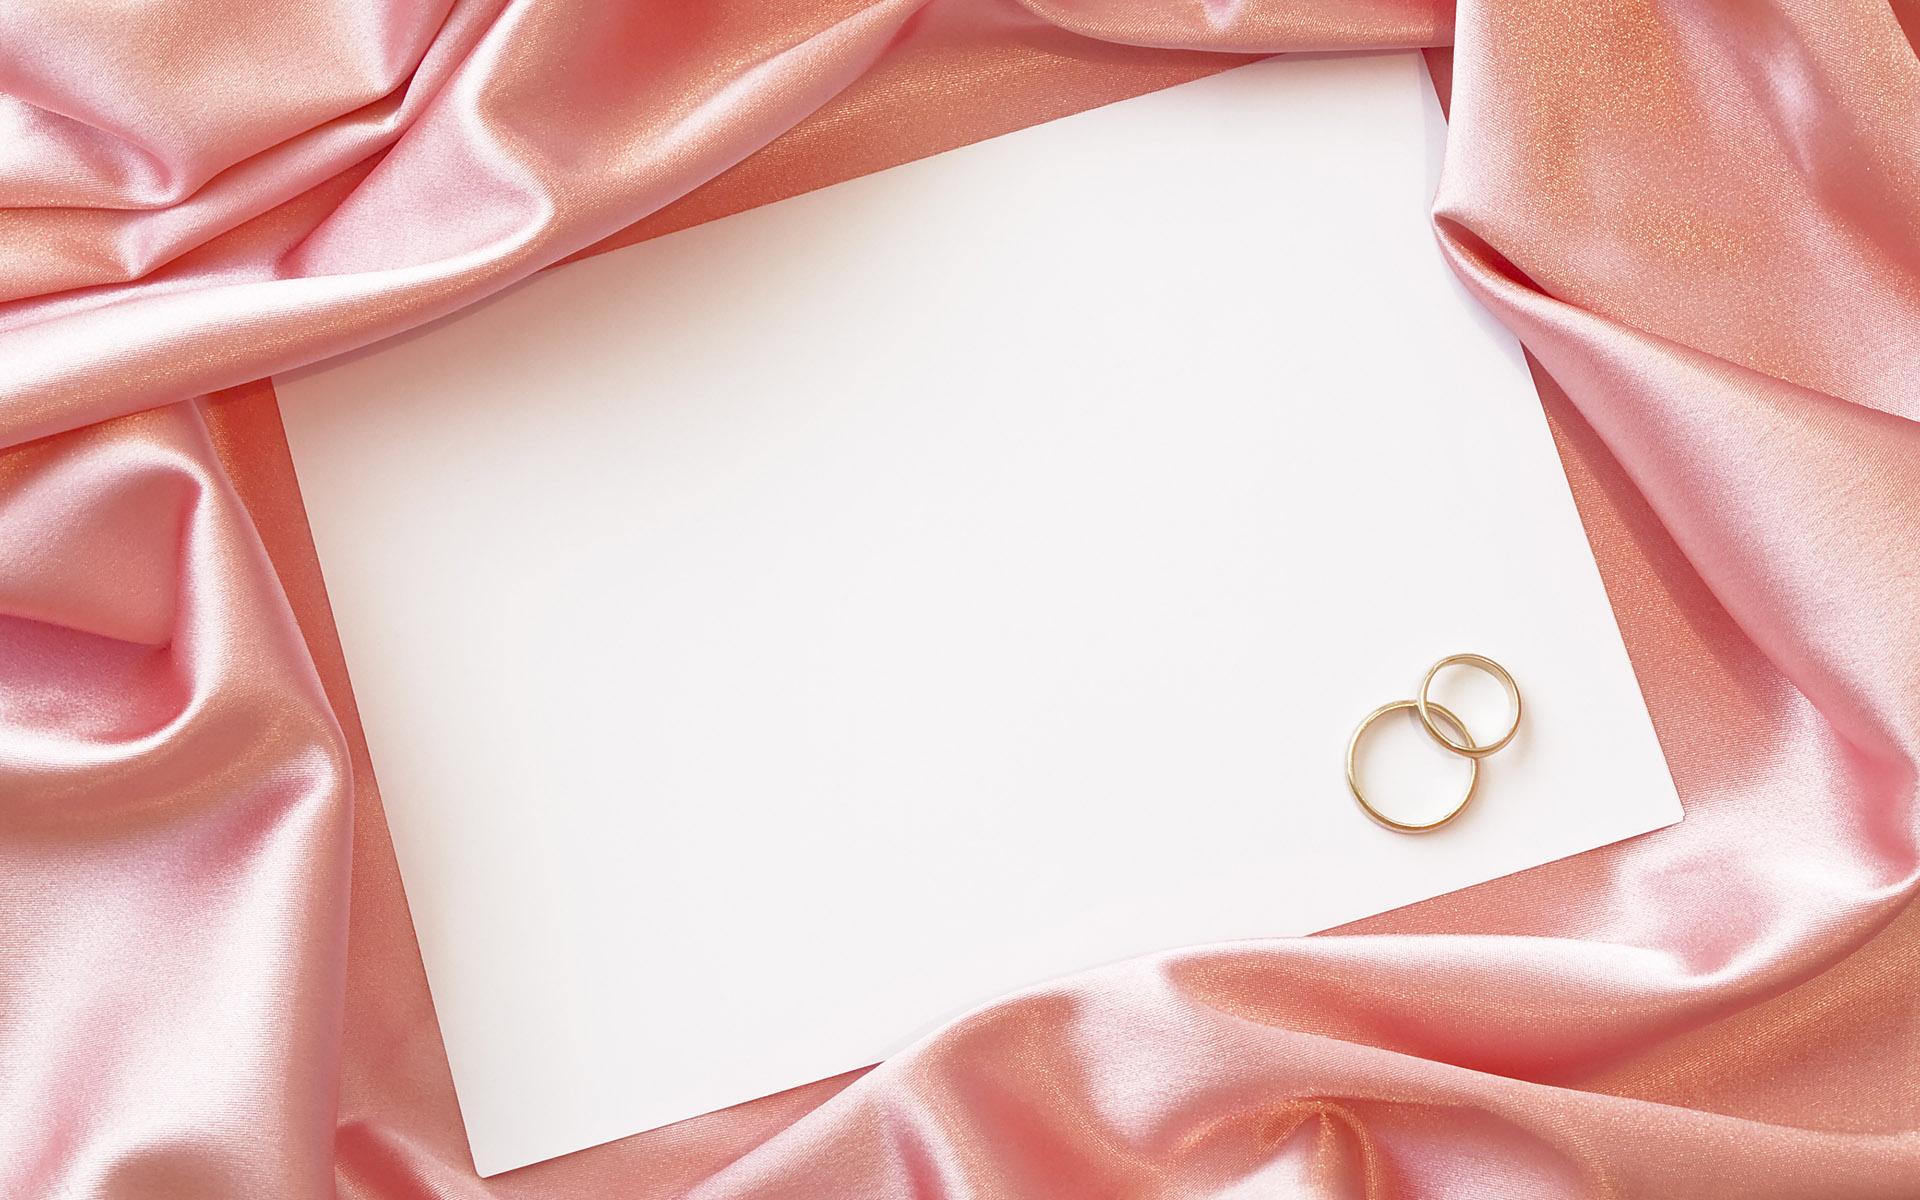 hd wedding backgrounds wallpapersafari. Black Bedroom Furniture Sets. Home Design Ideas